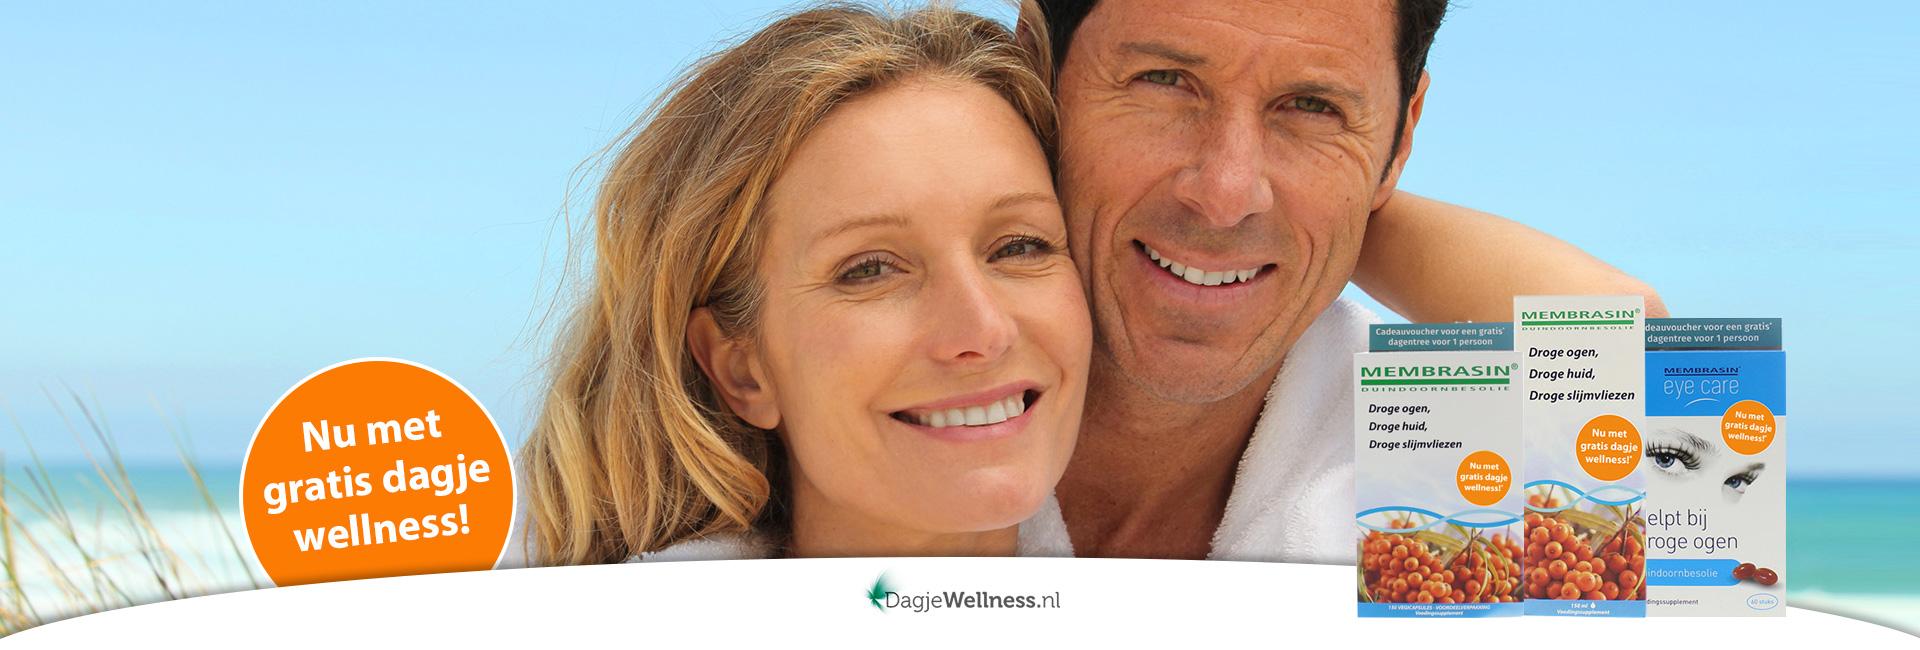 wellnessactie-Membrasin-slider2019